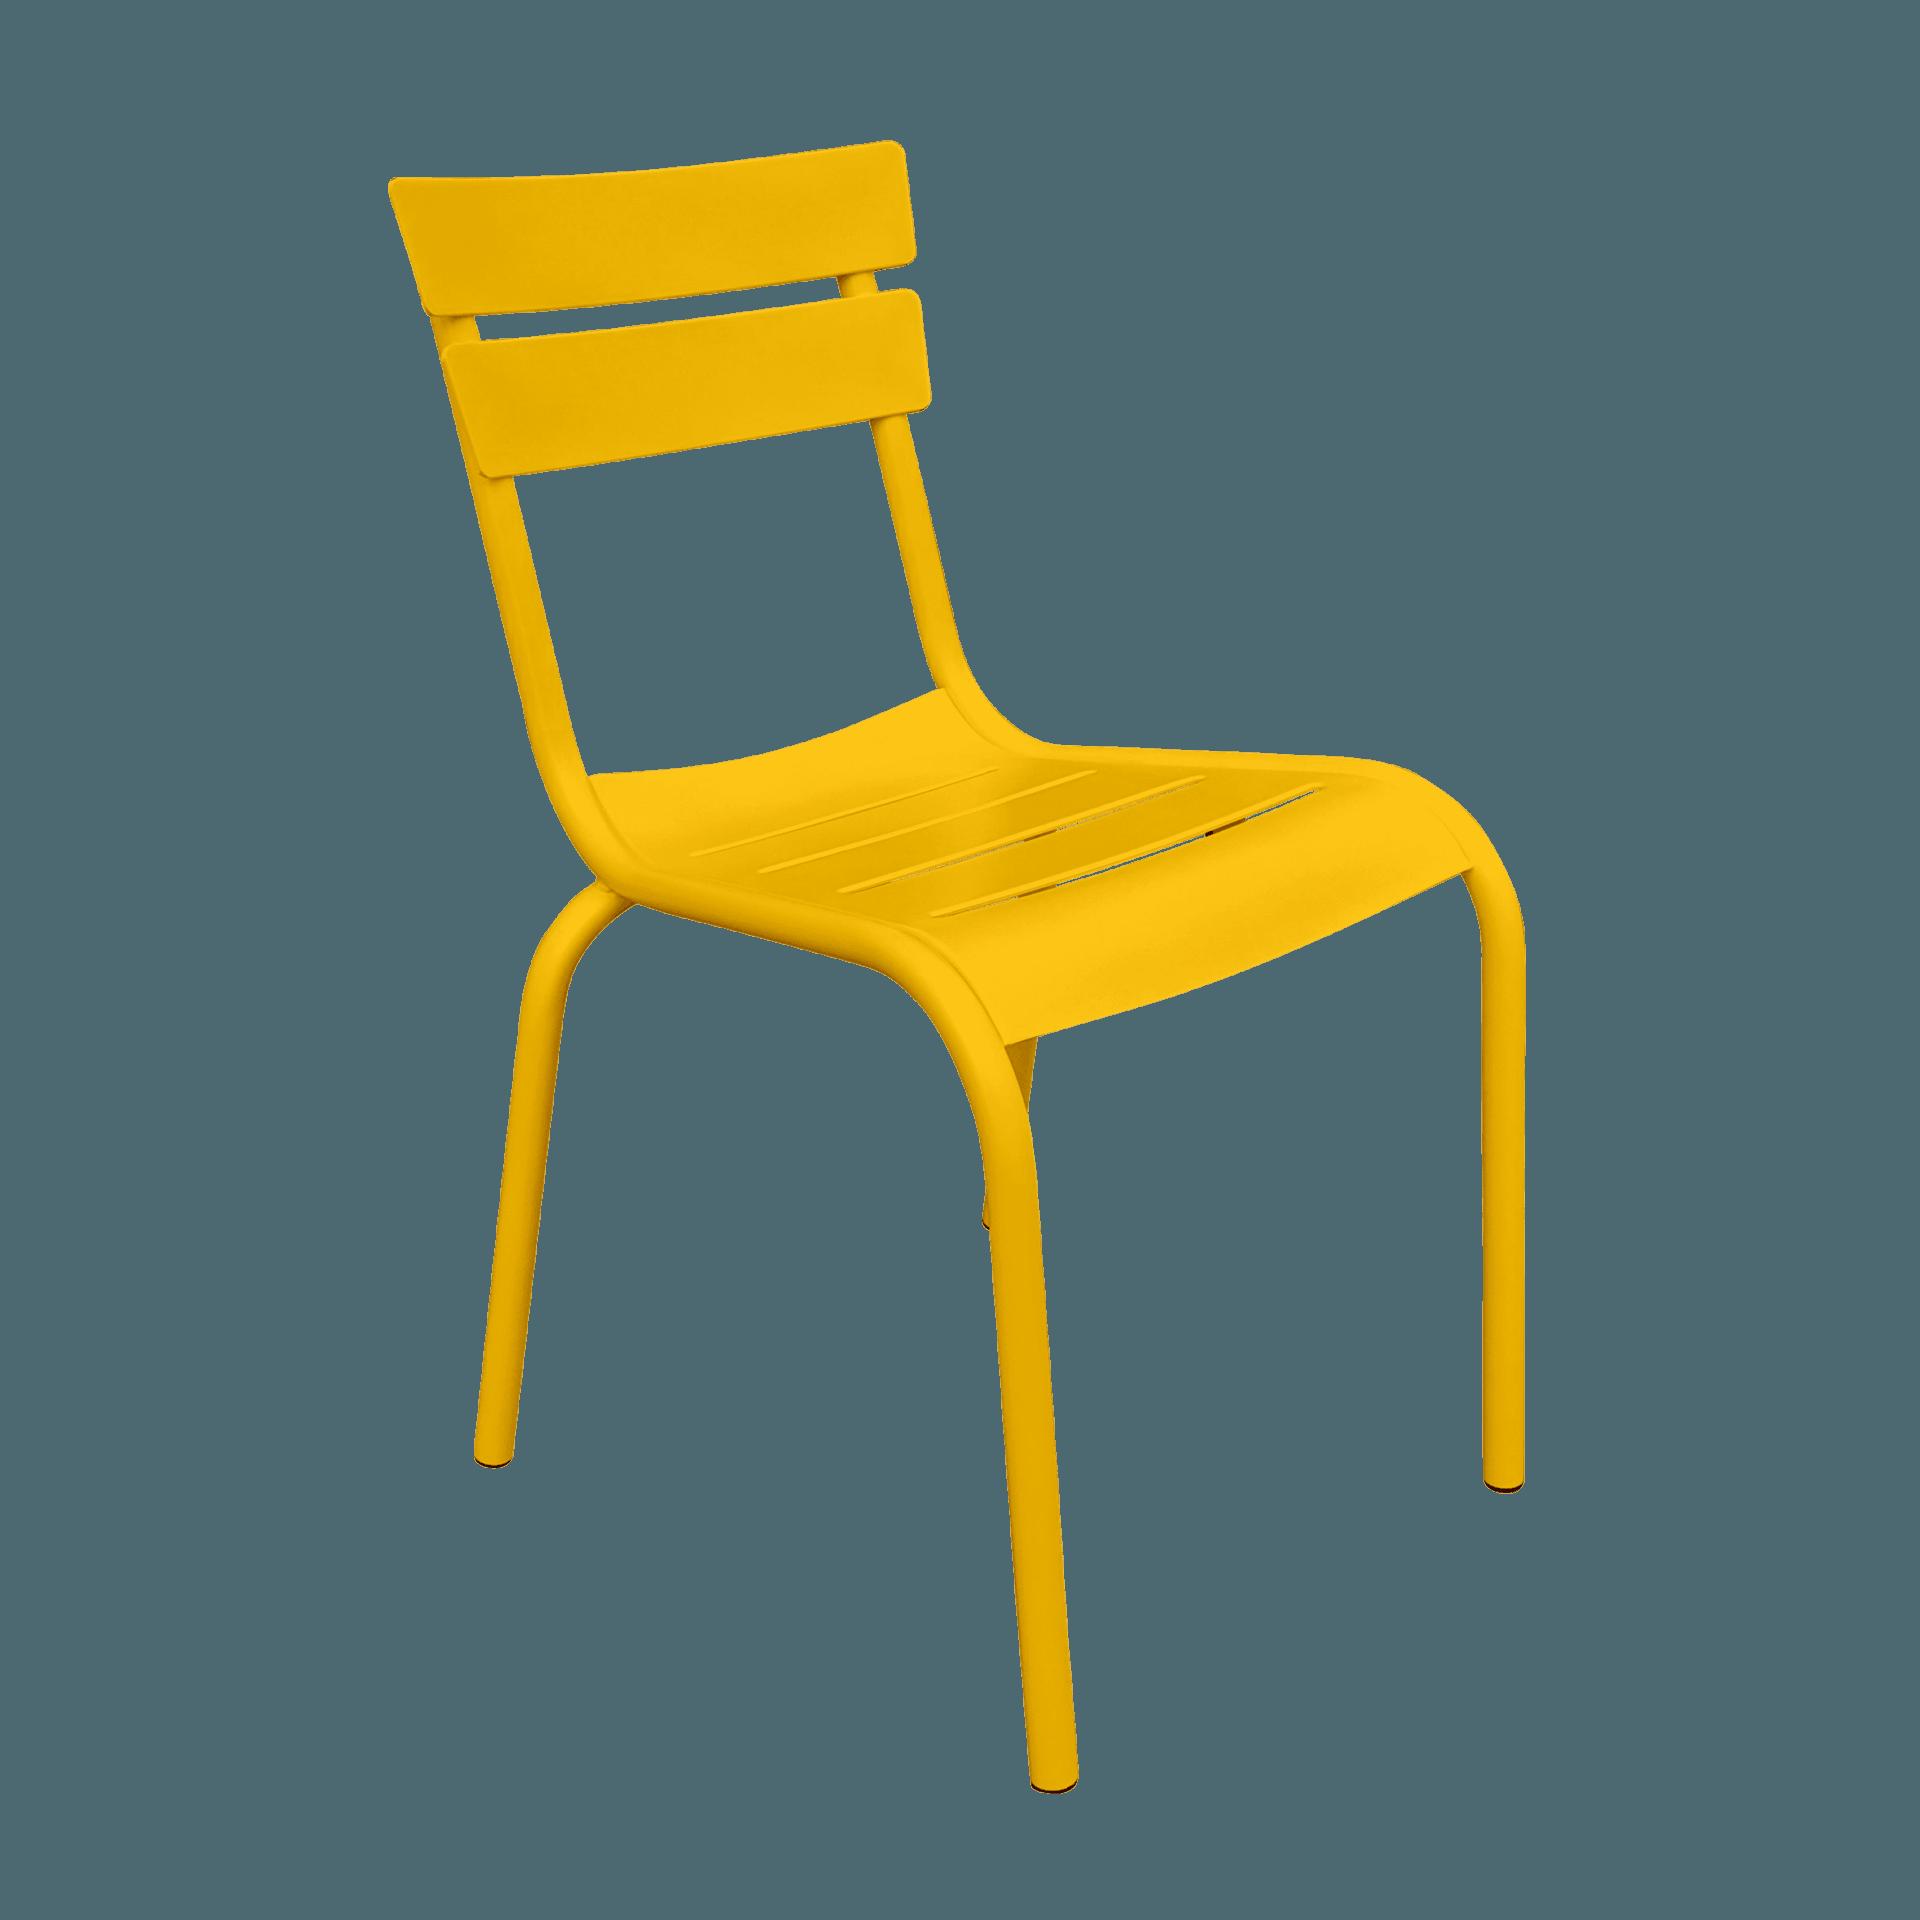 portochair yellow